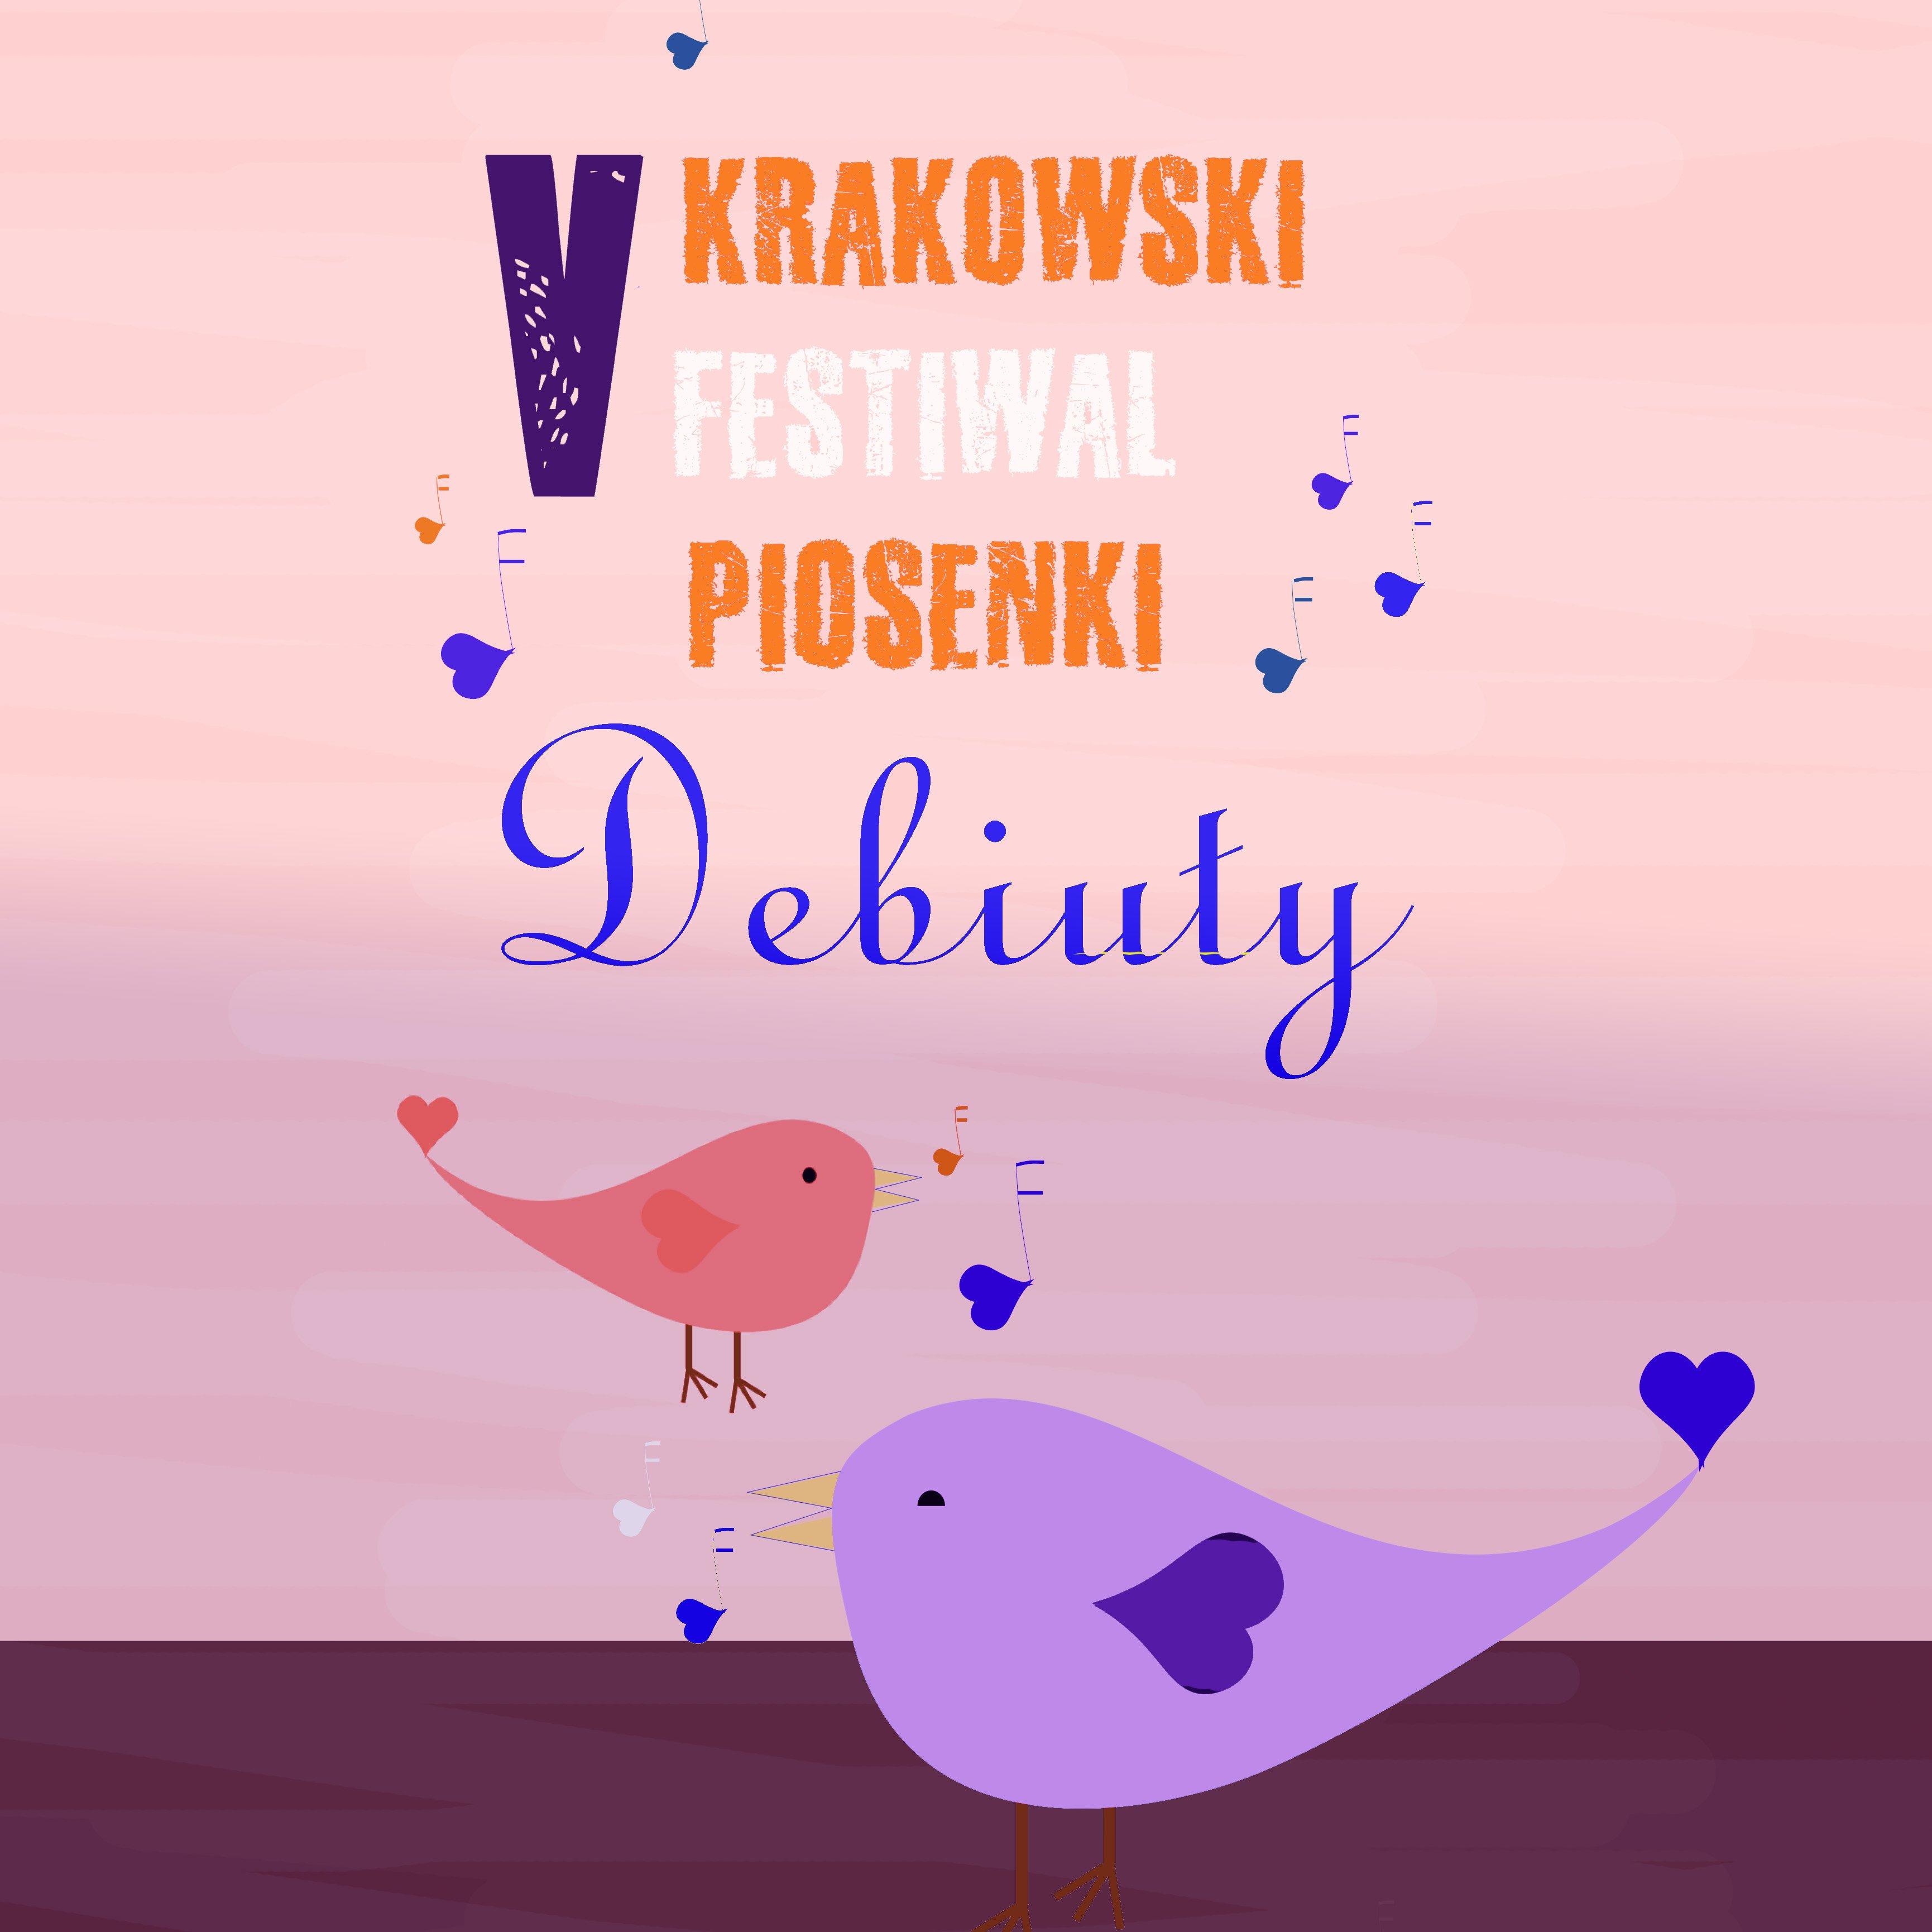 V Krakowski Festiwal Piosenki Debiuty